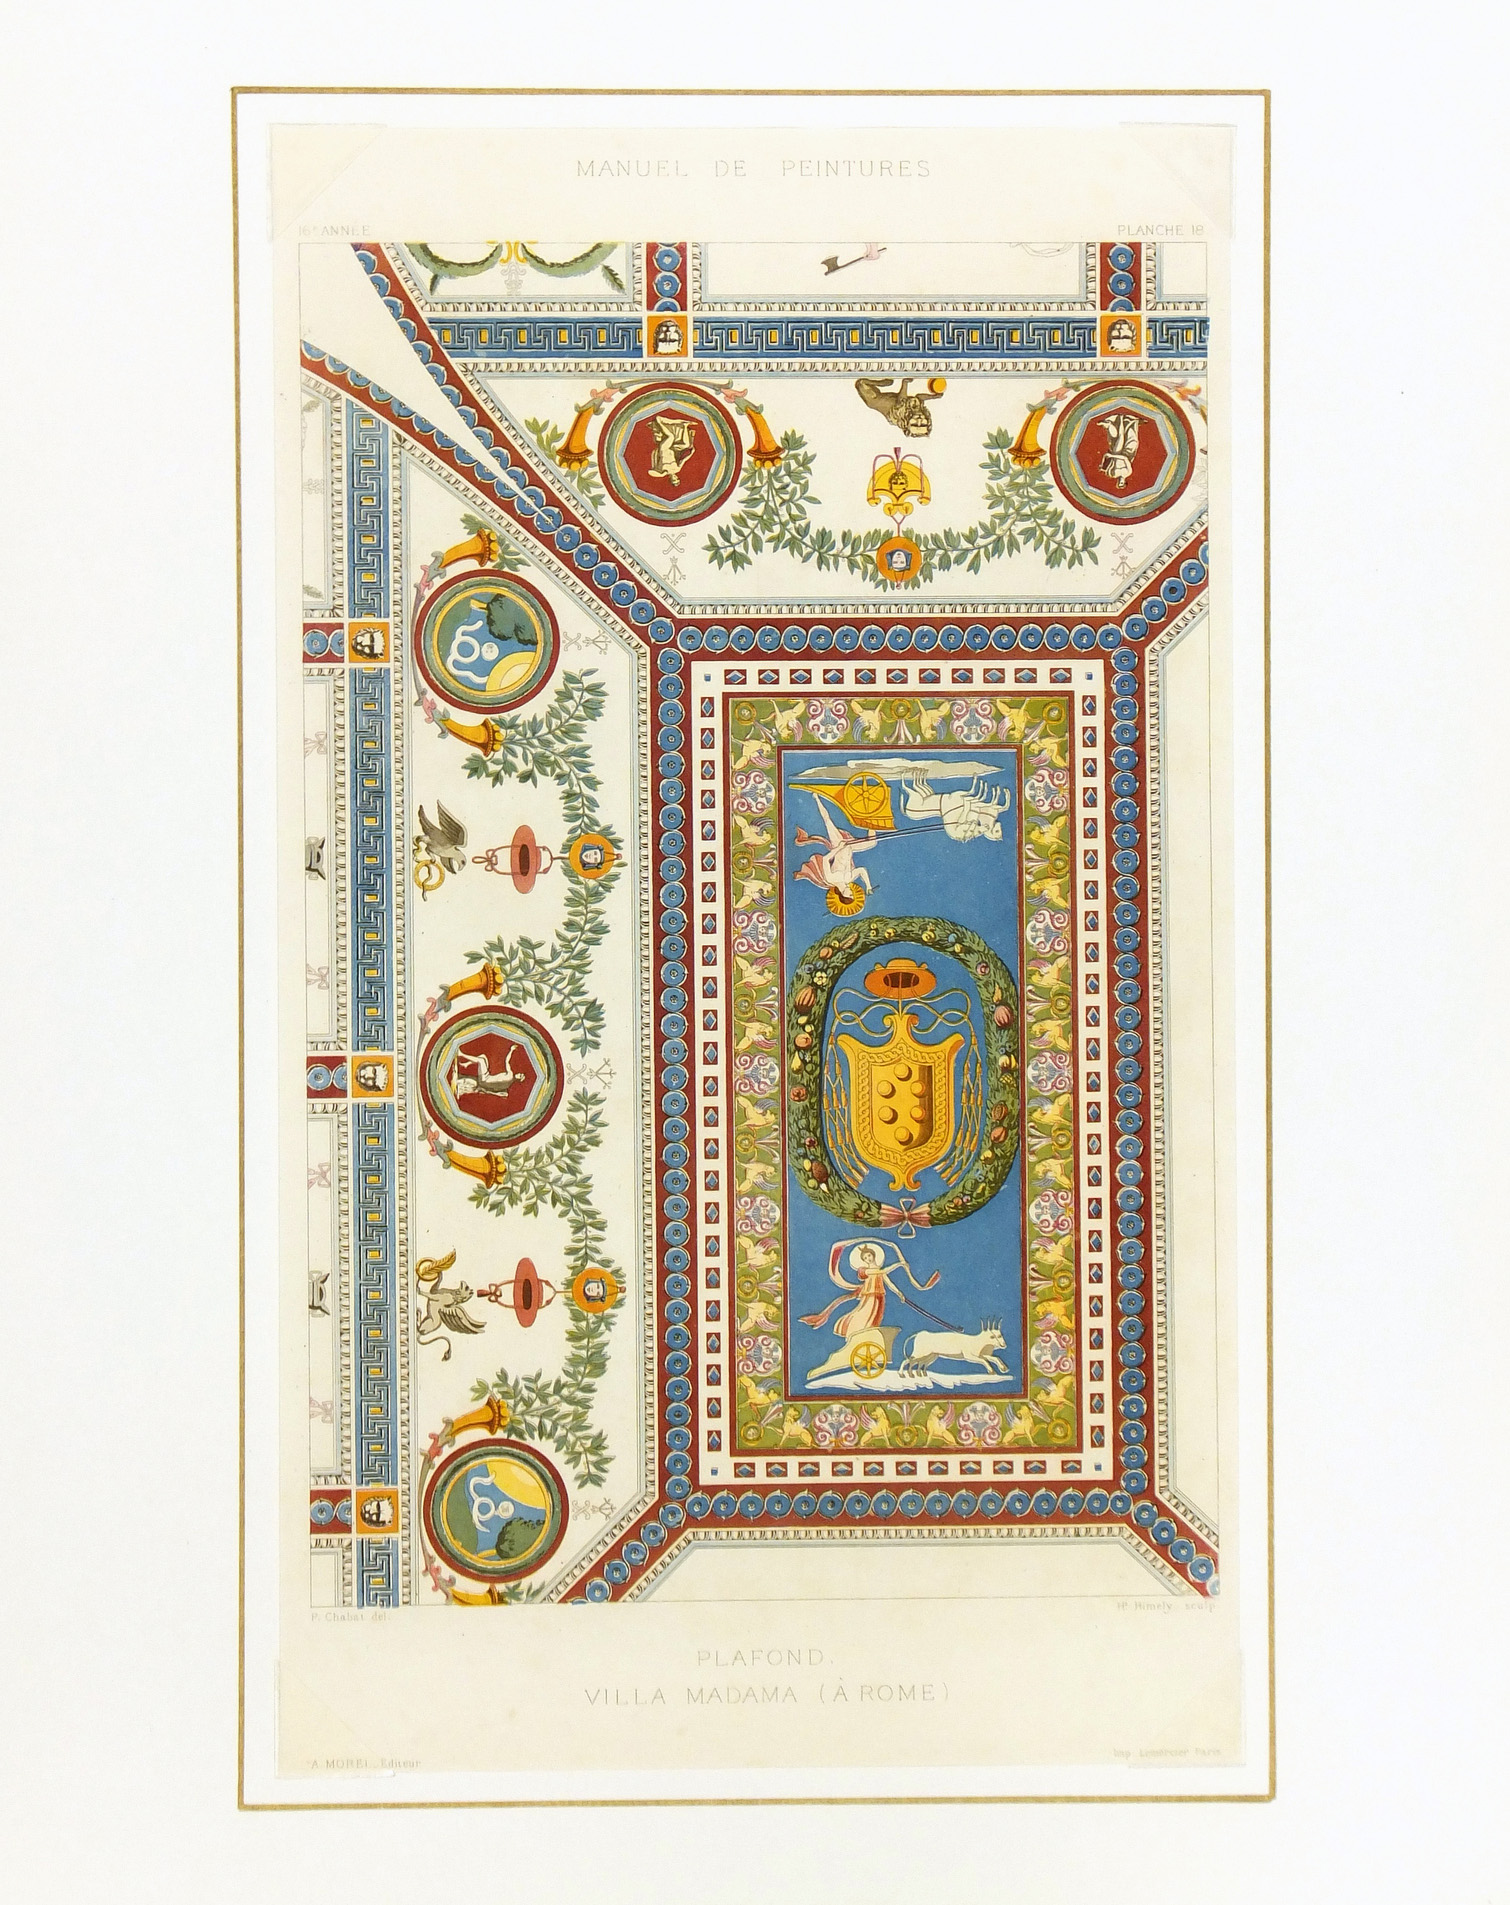 Villa Madama Rome, 1867-matted-K5122